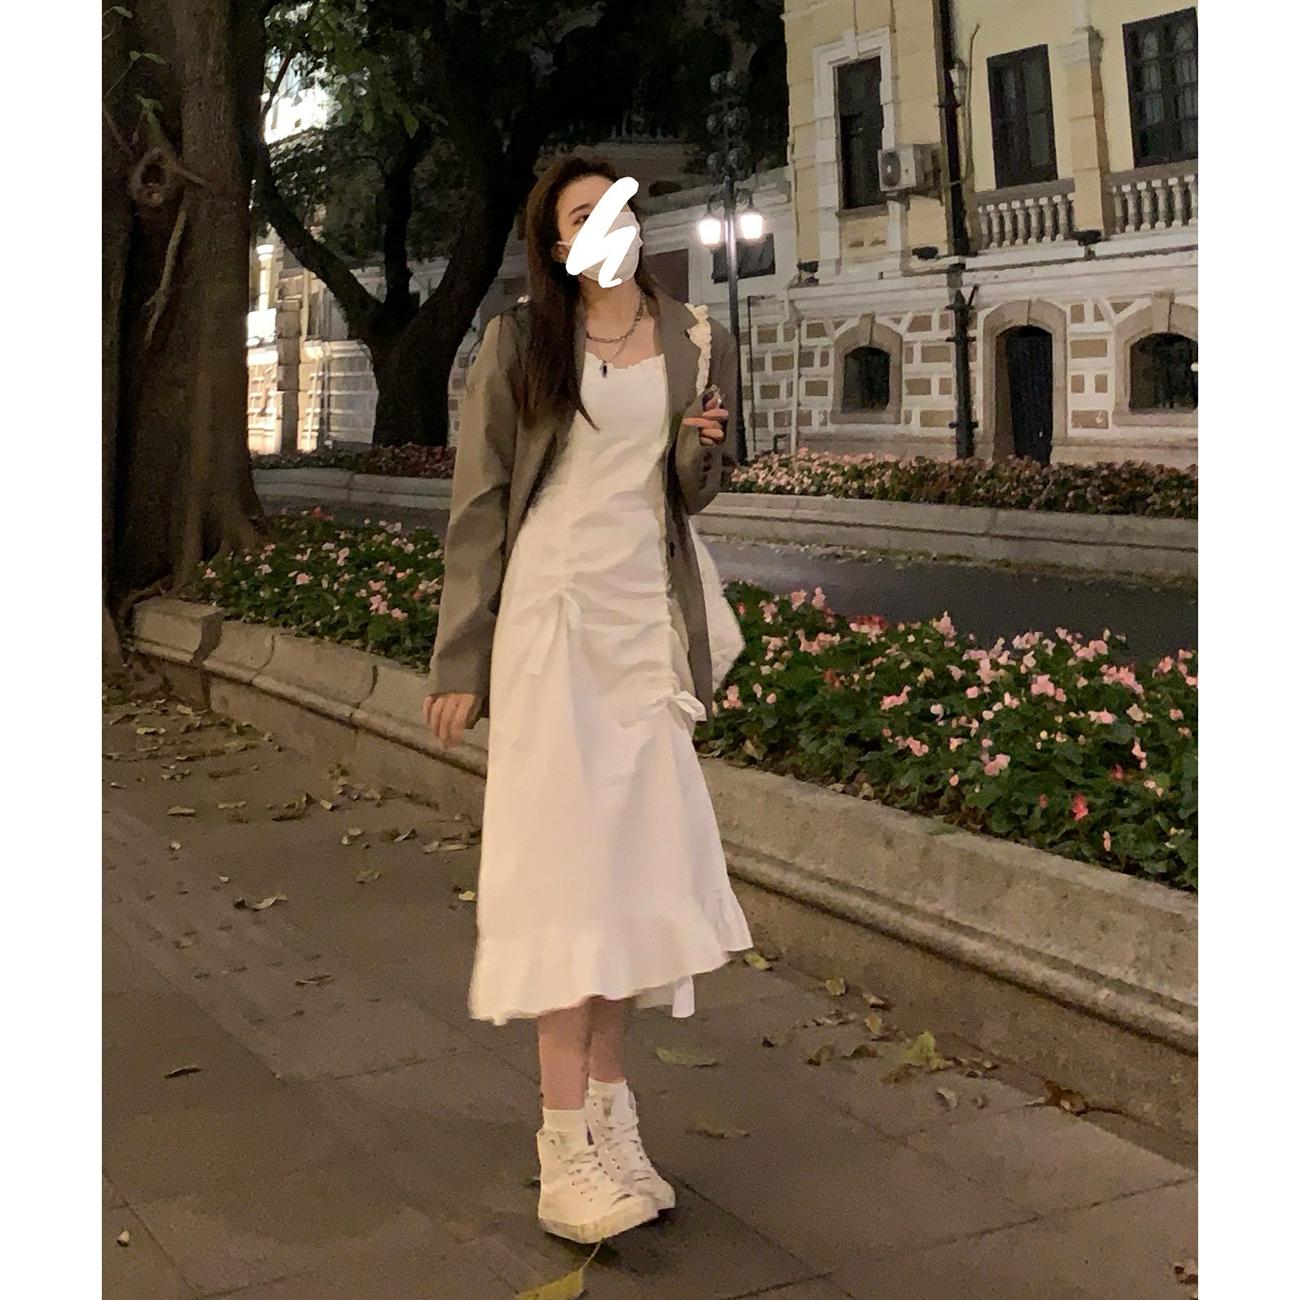 DREAMSEVEN77吊带连衣裙女2021年早春新款黑白色高级感荷叶边裙子